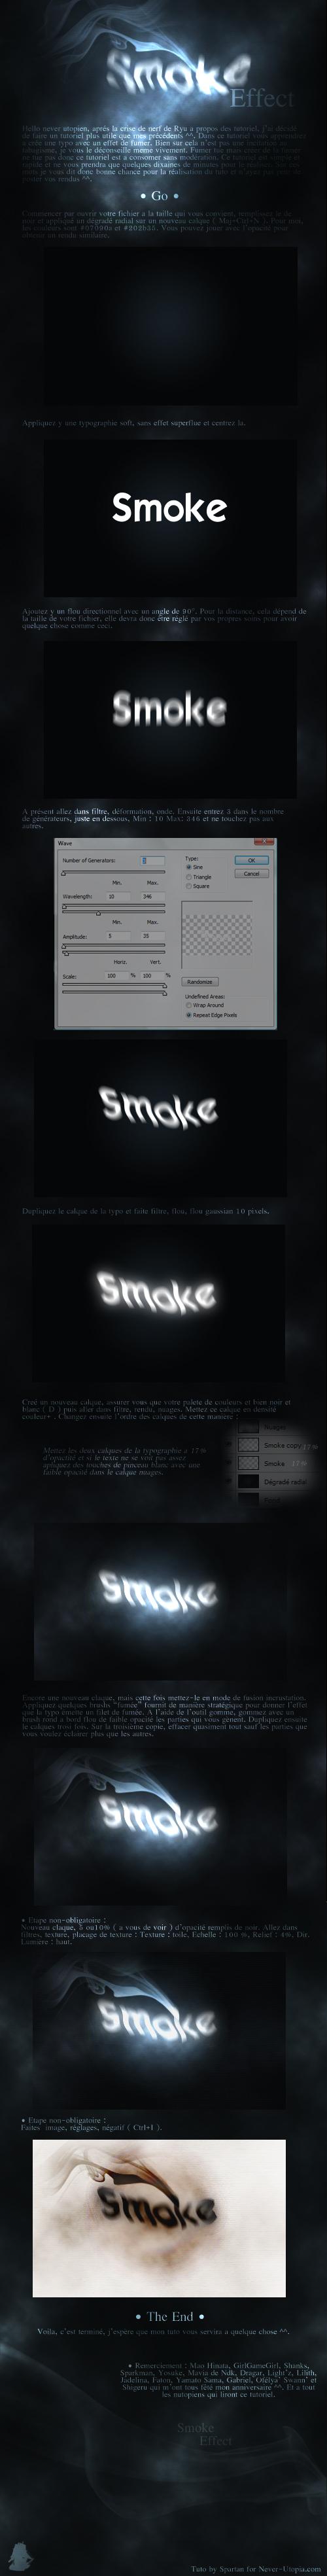 [Moyen] Typo Smoke [Wallpapers][Photoshop] Tuto_Typo_Smoke_by_Spartan_Art